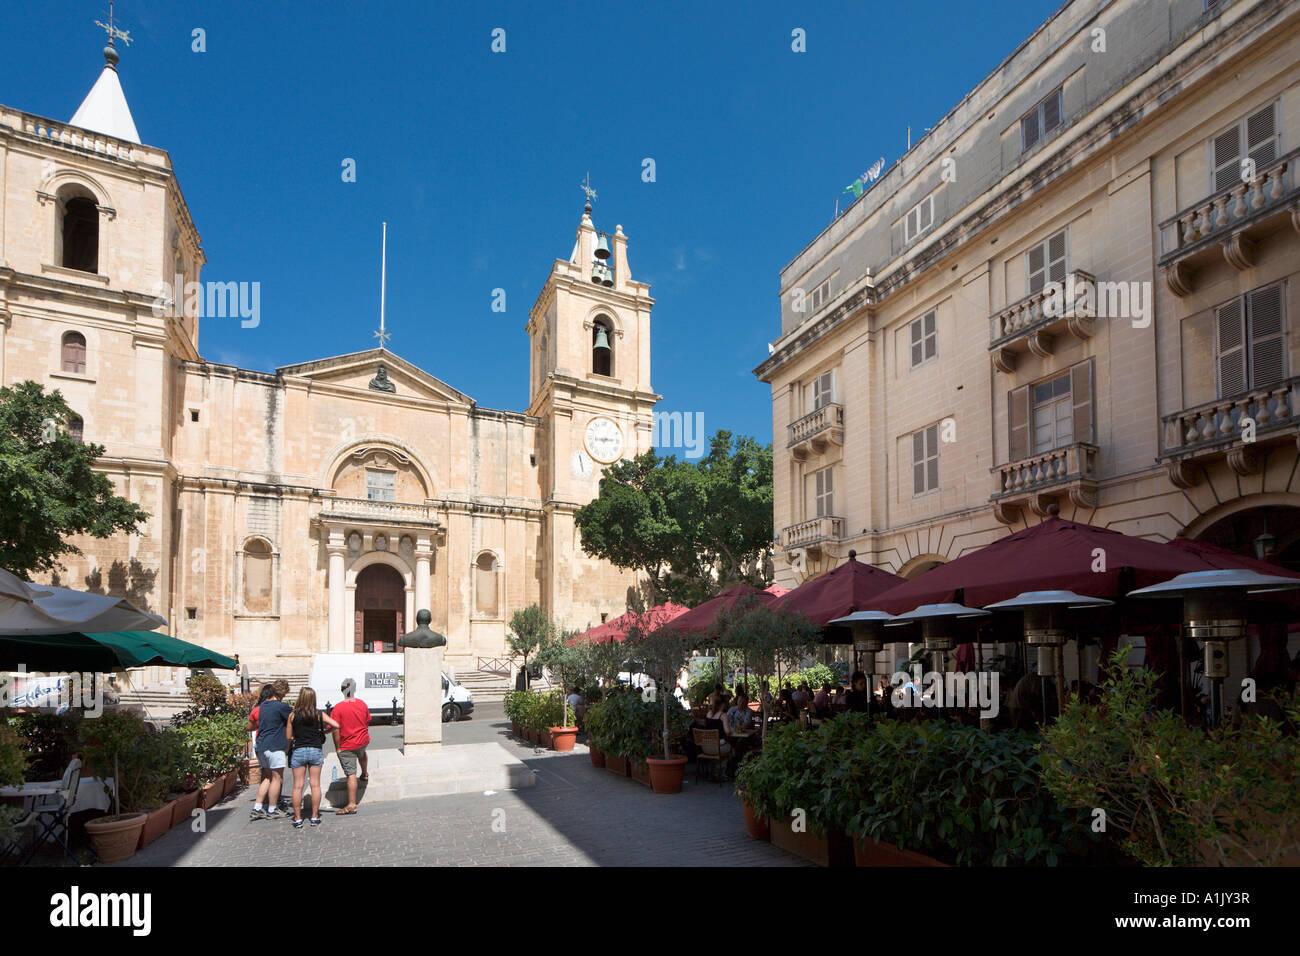 Restaurant and St John's Co Cathedral, St John's Square, Valletta, Malta - Stock Image